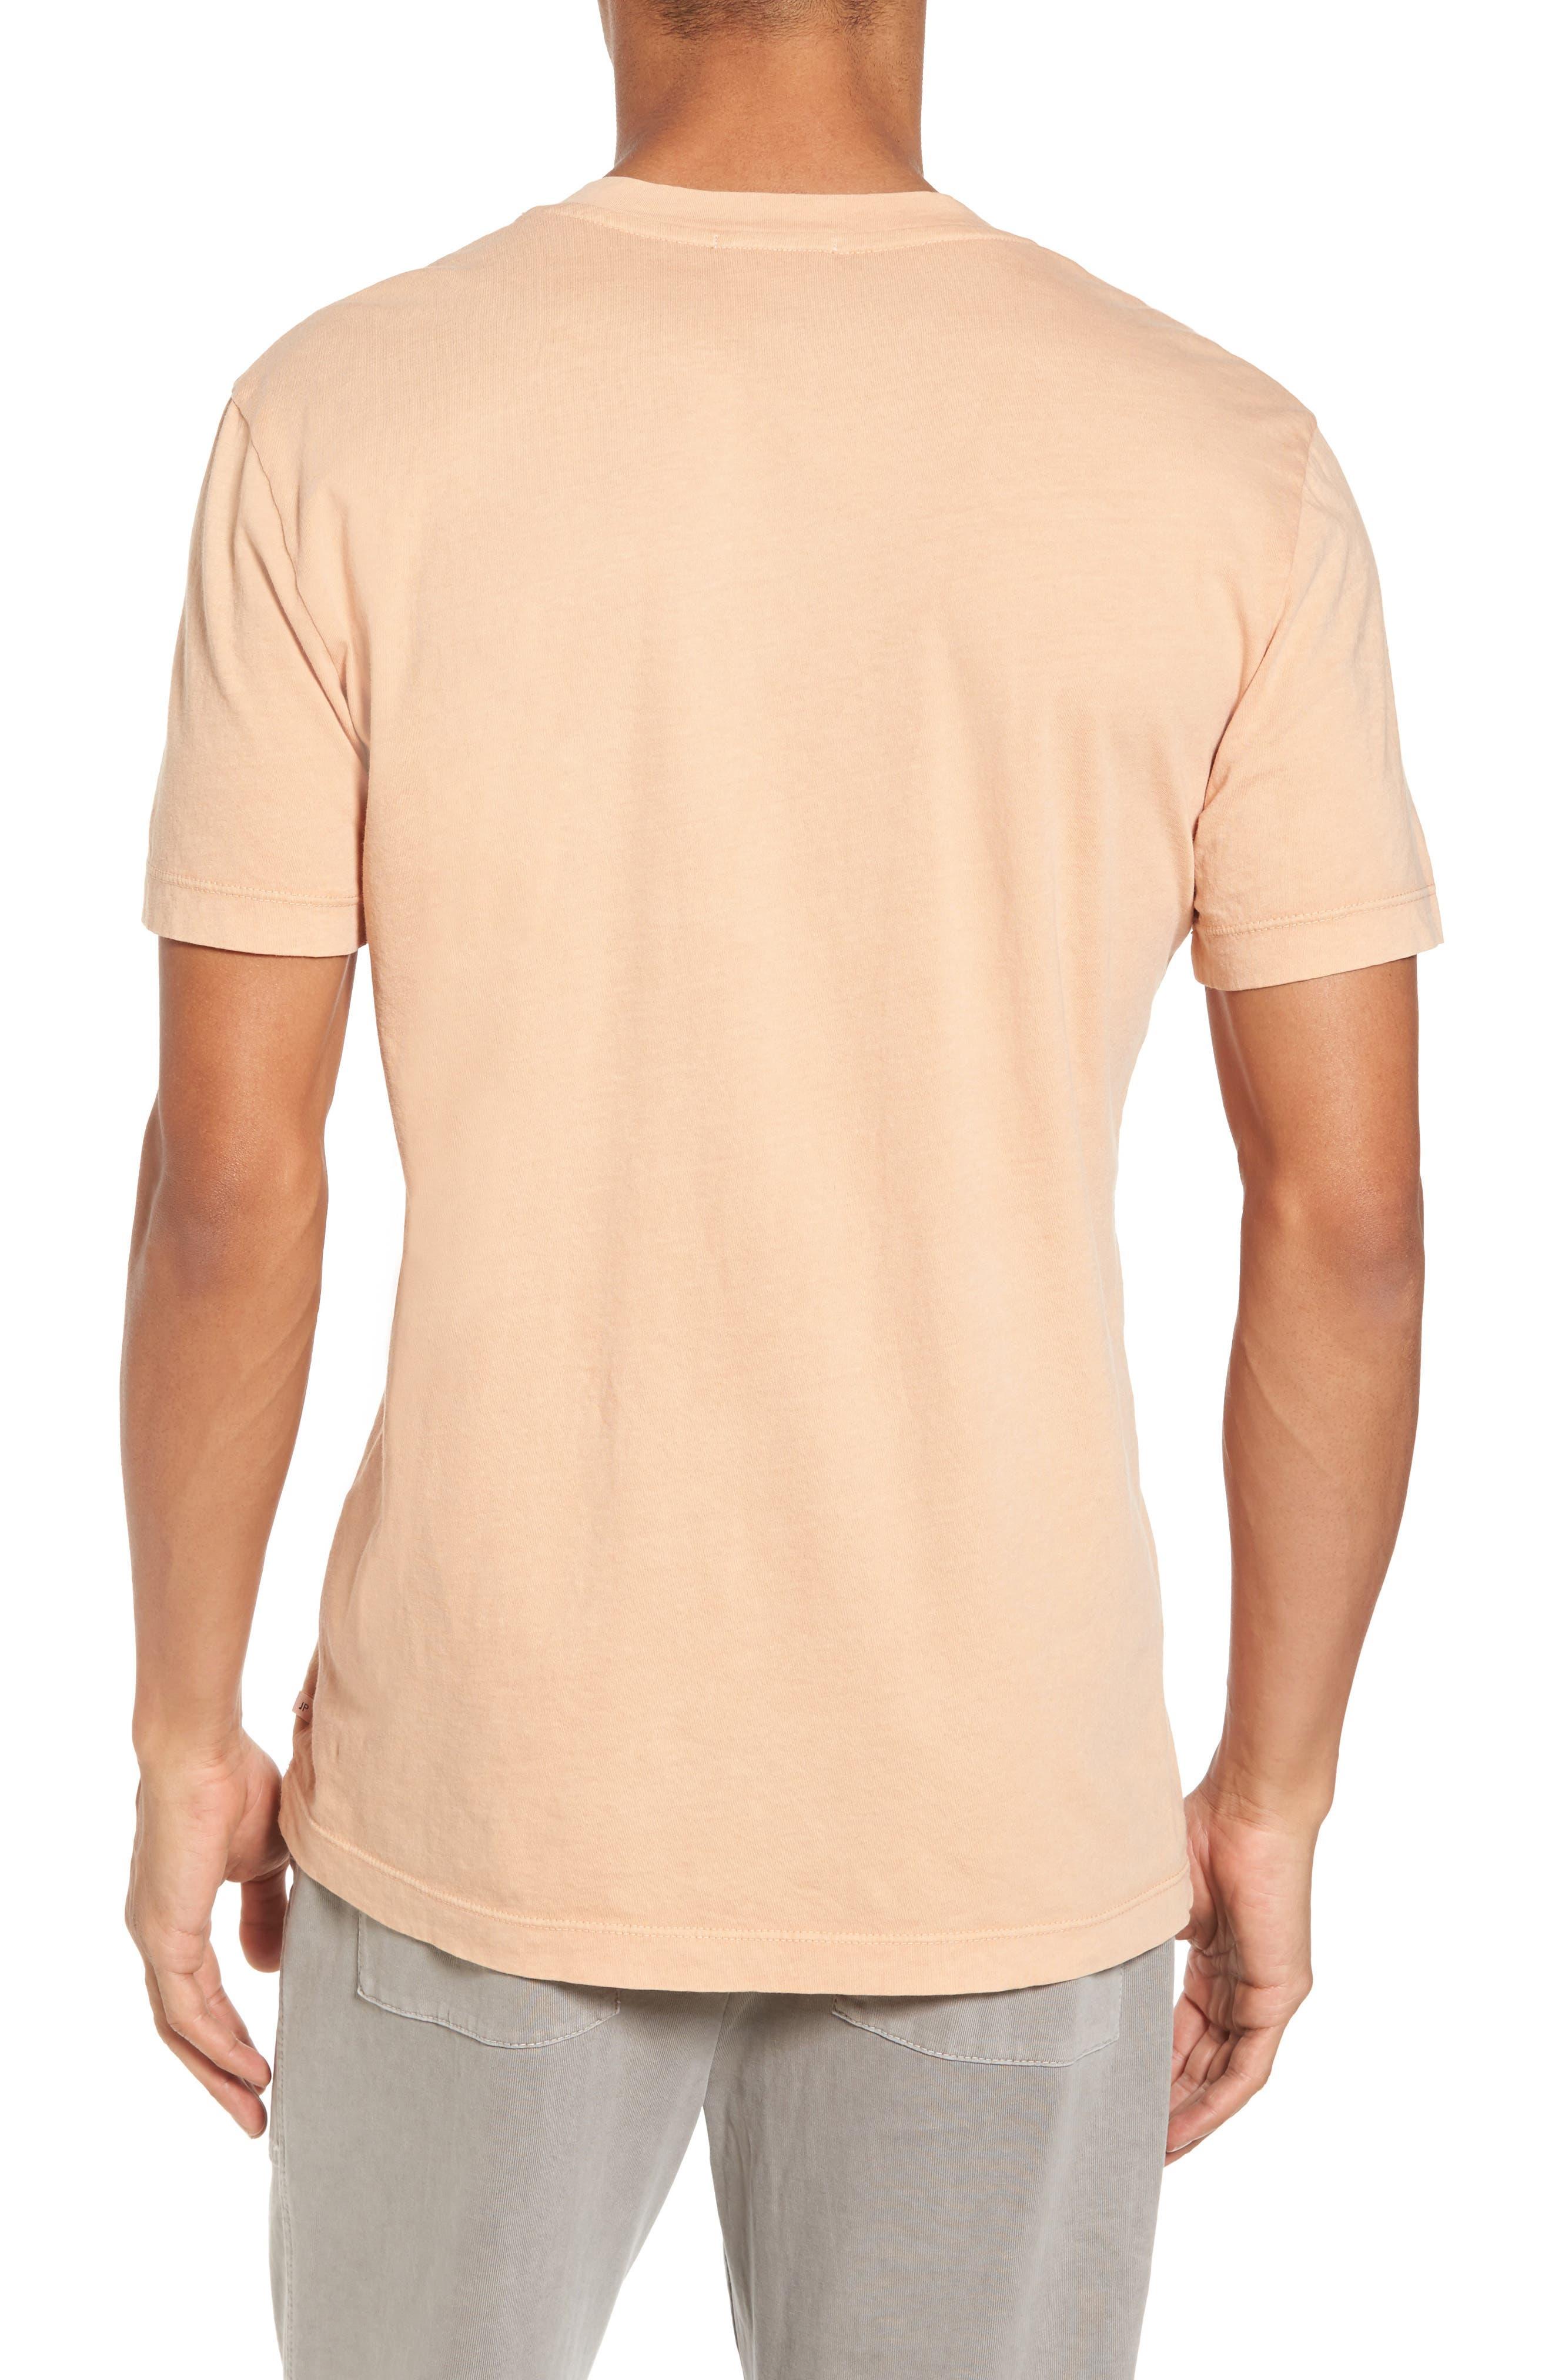 Alternate Image 2  - James Perse Short Sleeve V-Neck T-Shirt